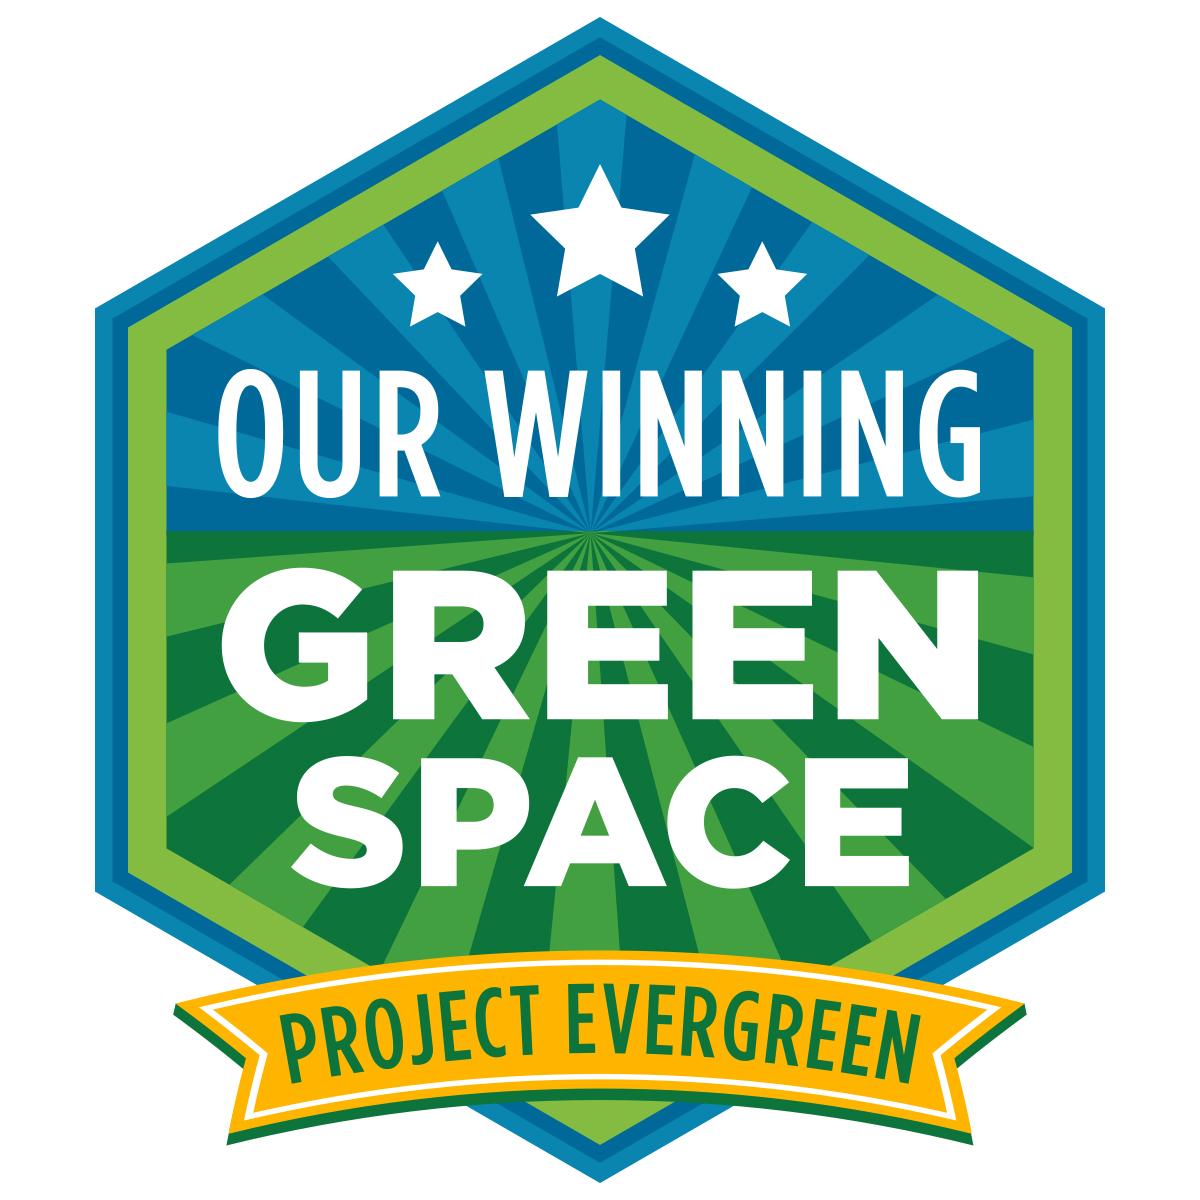 MyWinning-GreenSpace-logo.jpg